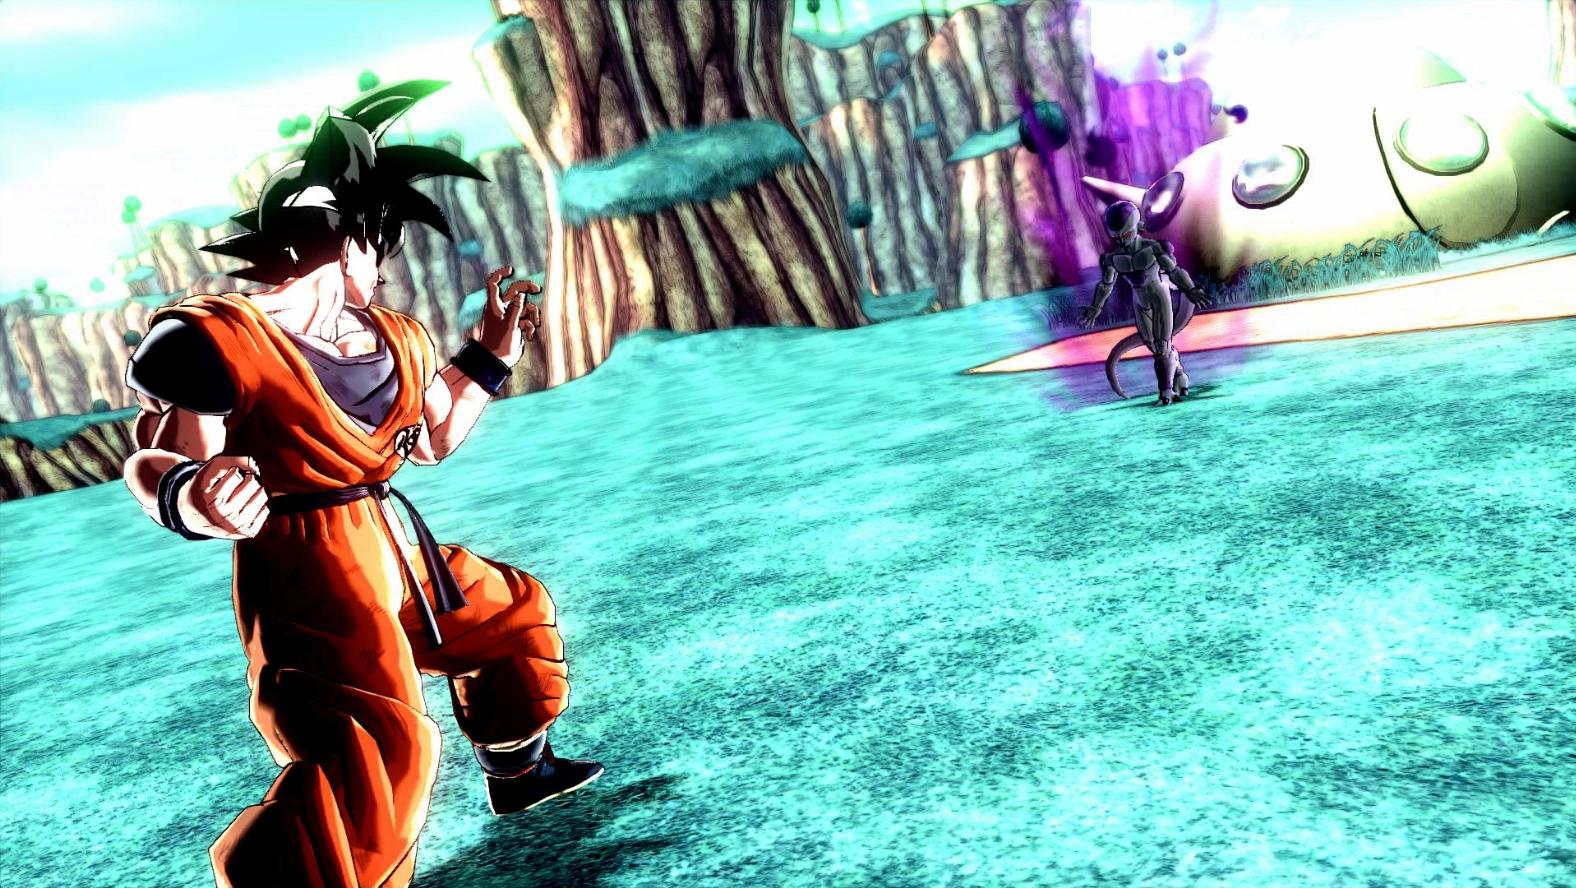 Dragon Ball Xenoverse_Haruhichan.com Jan 2015 Screenshots 16